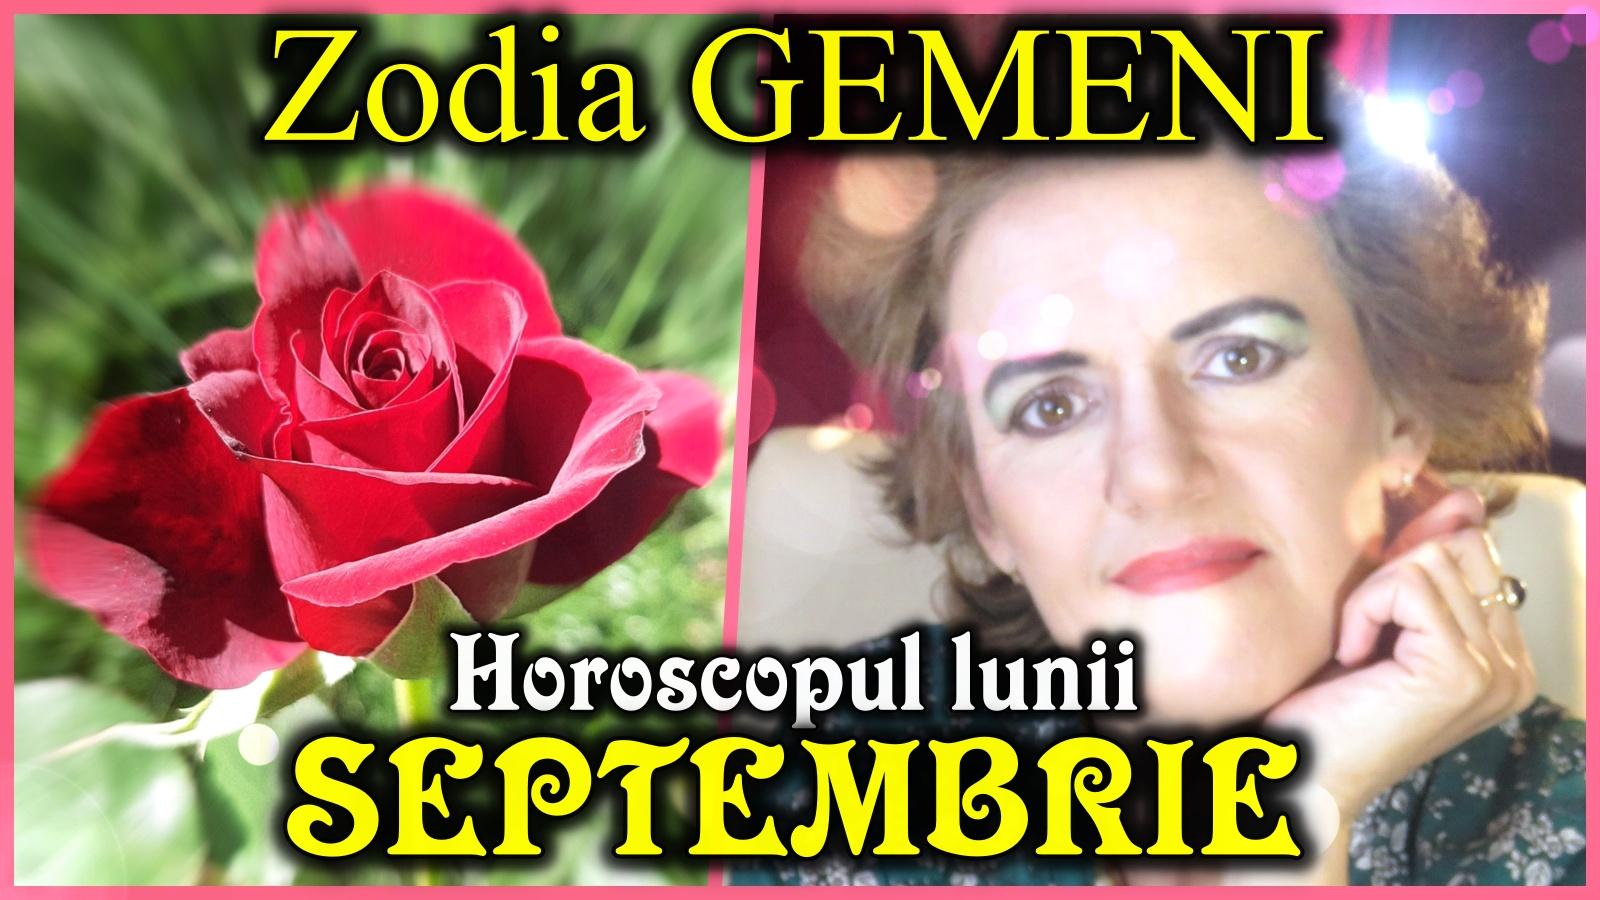 Horoscopul lunii SEPTEMBRIE * Zodia GEMENILOR